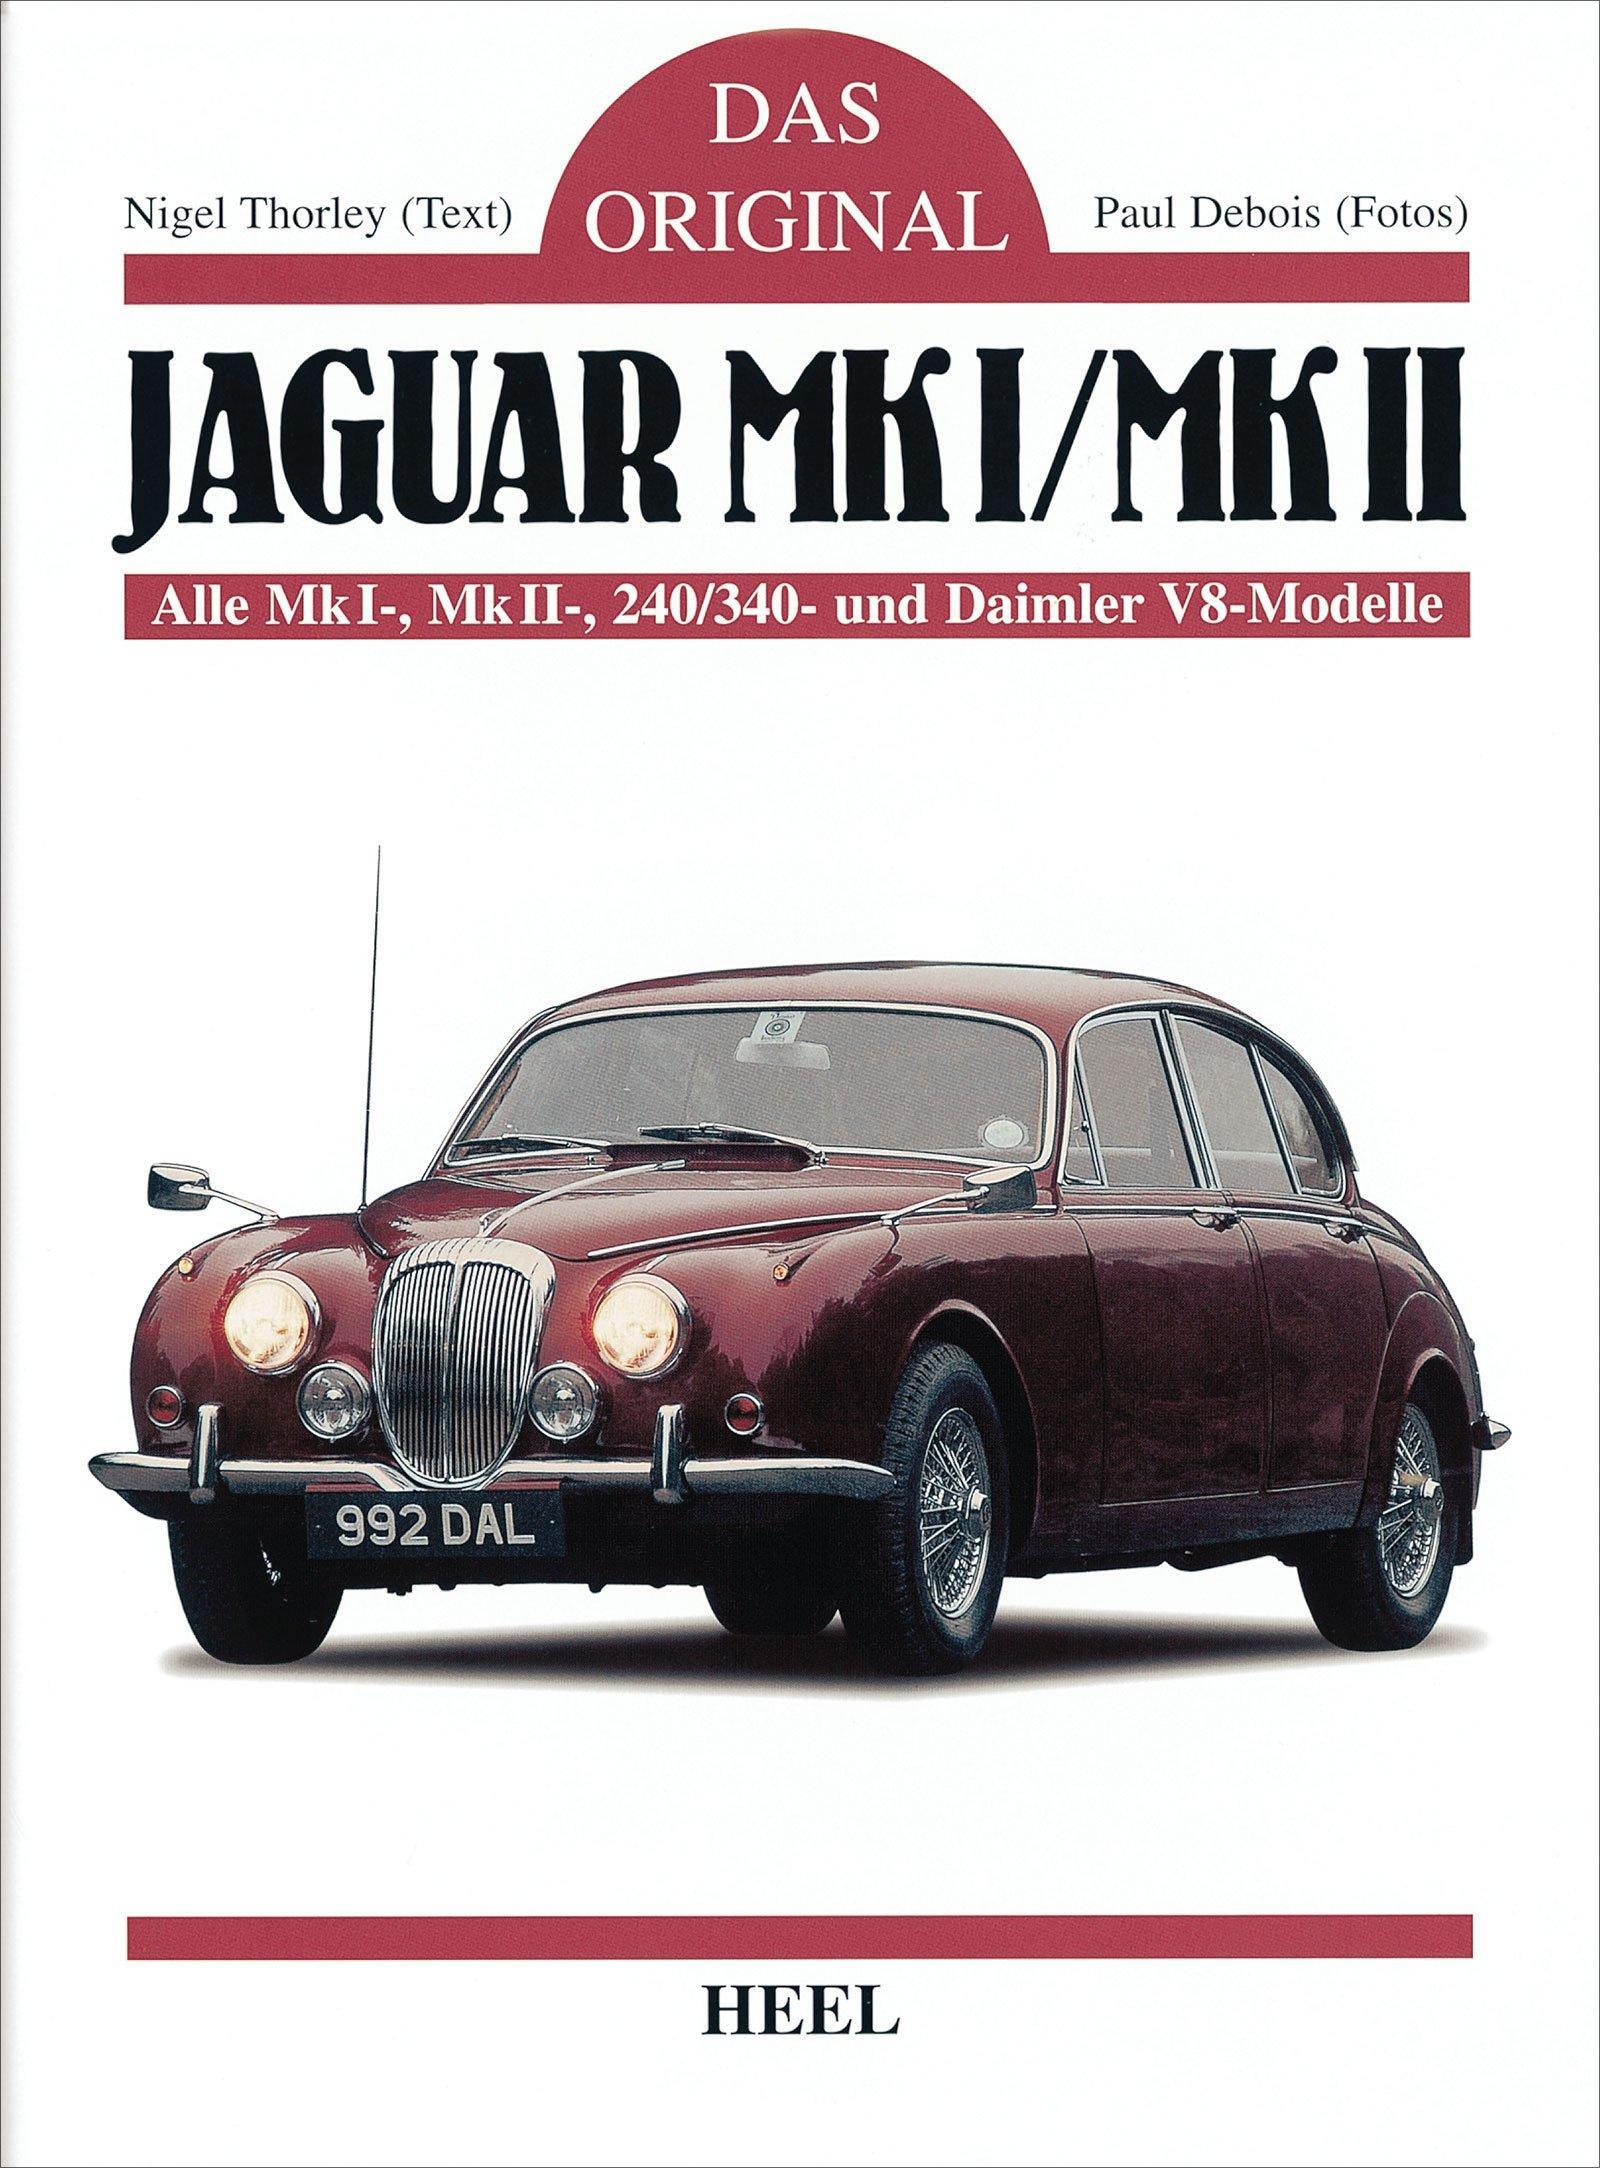 Das Original: Jaguar Mk I / Mk II